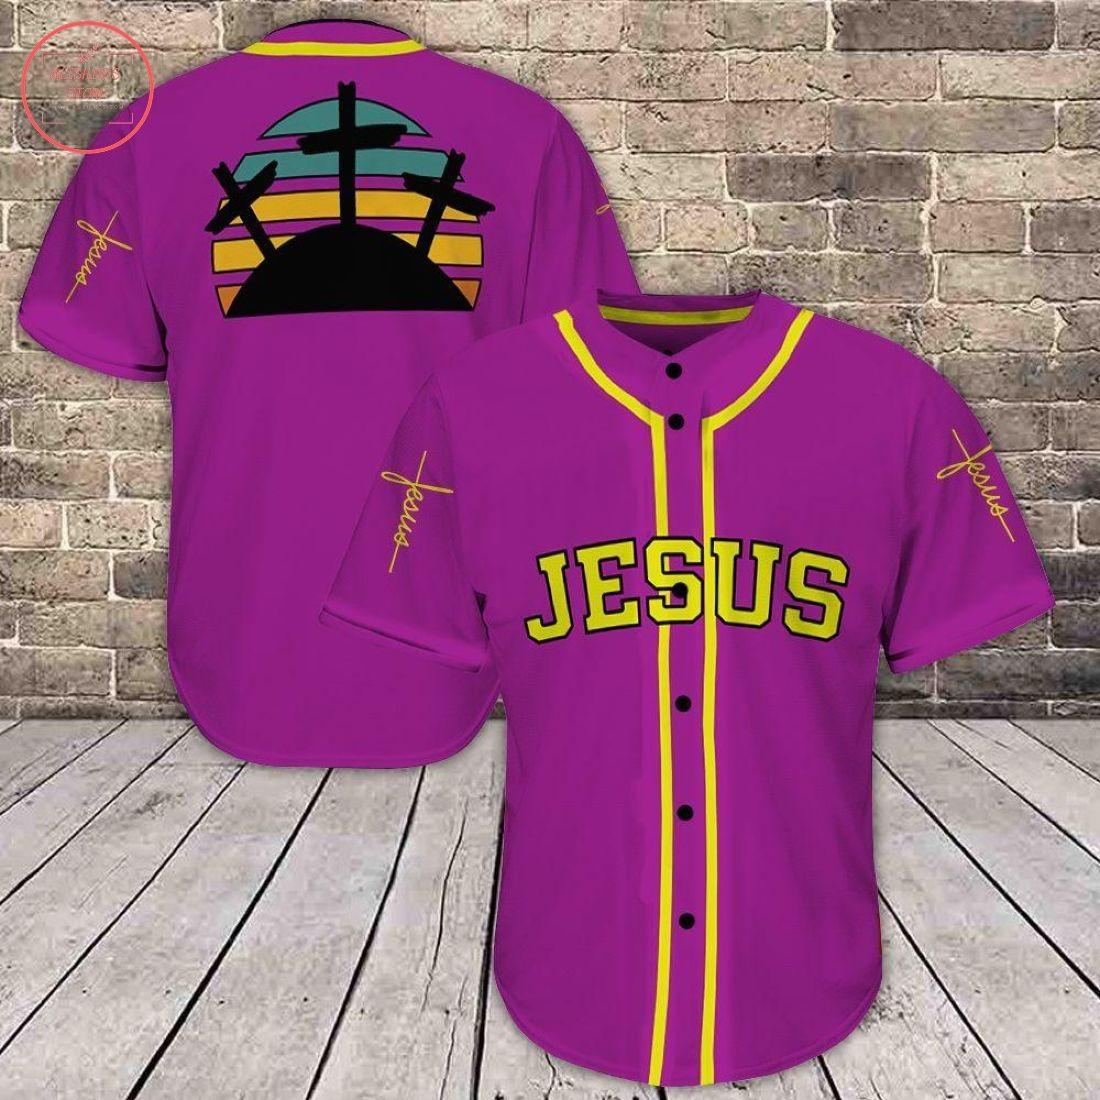 Jesus Purple All Over Print Baseball Jersey